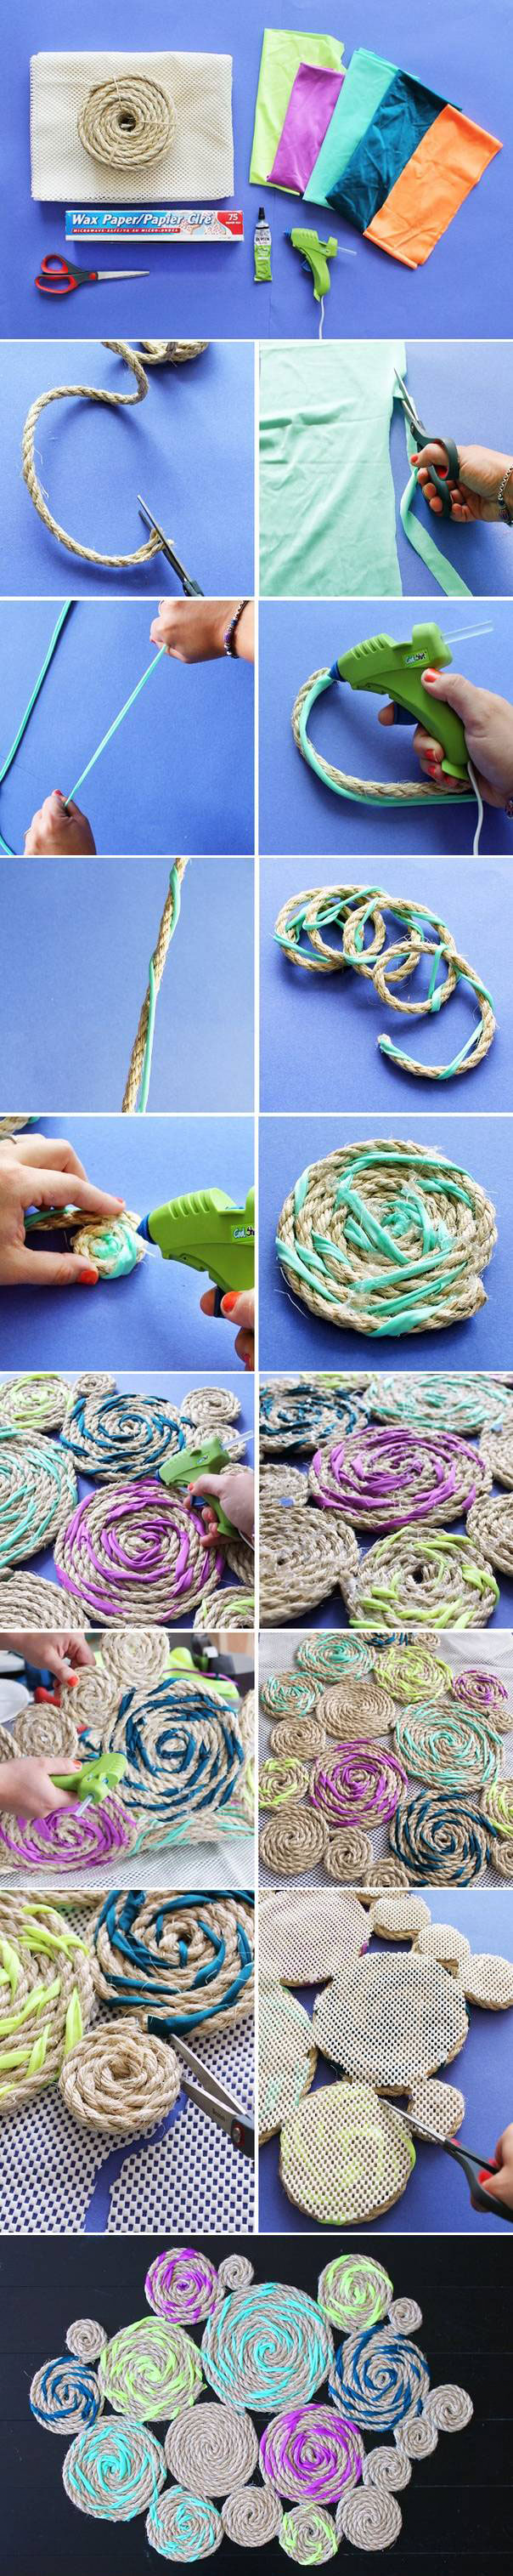 Výroba rohožky